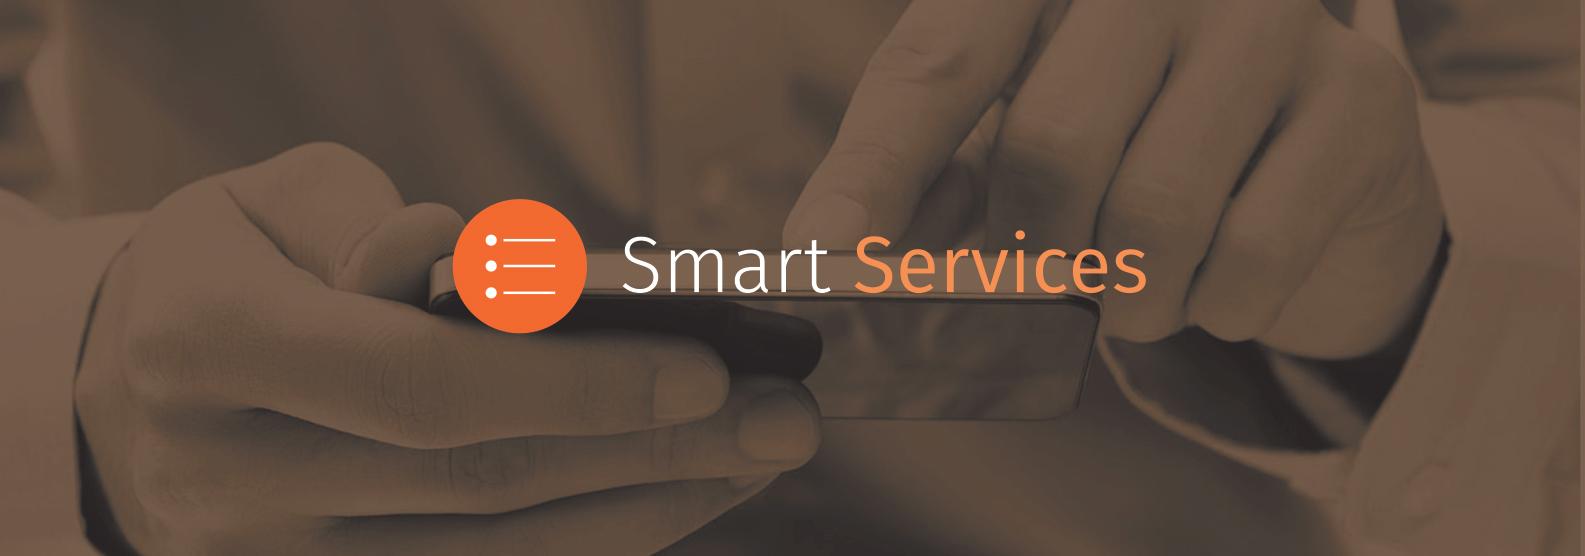 smart services.jpg